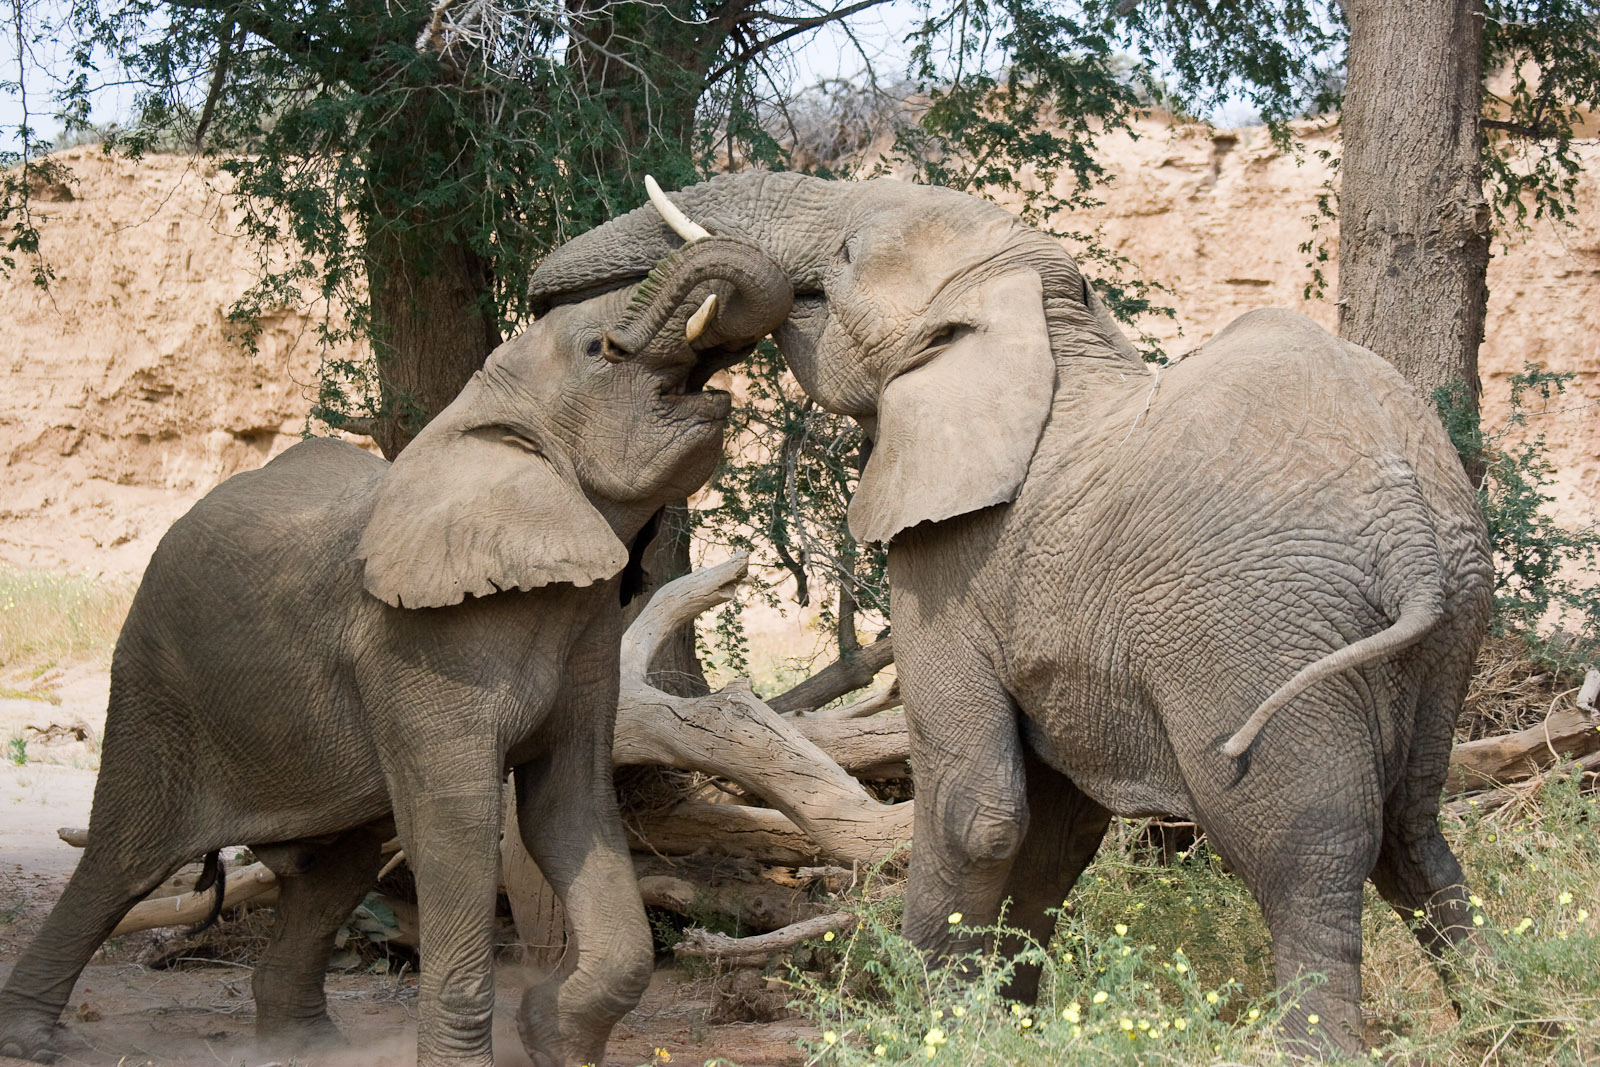 file:elephants fighting (3690385570) - wikimedia commons